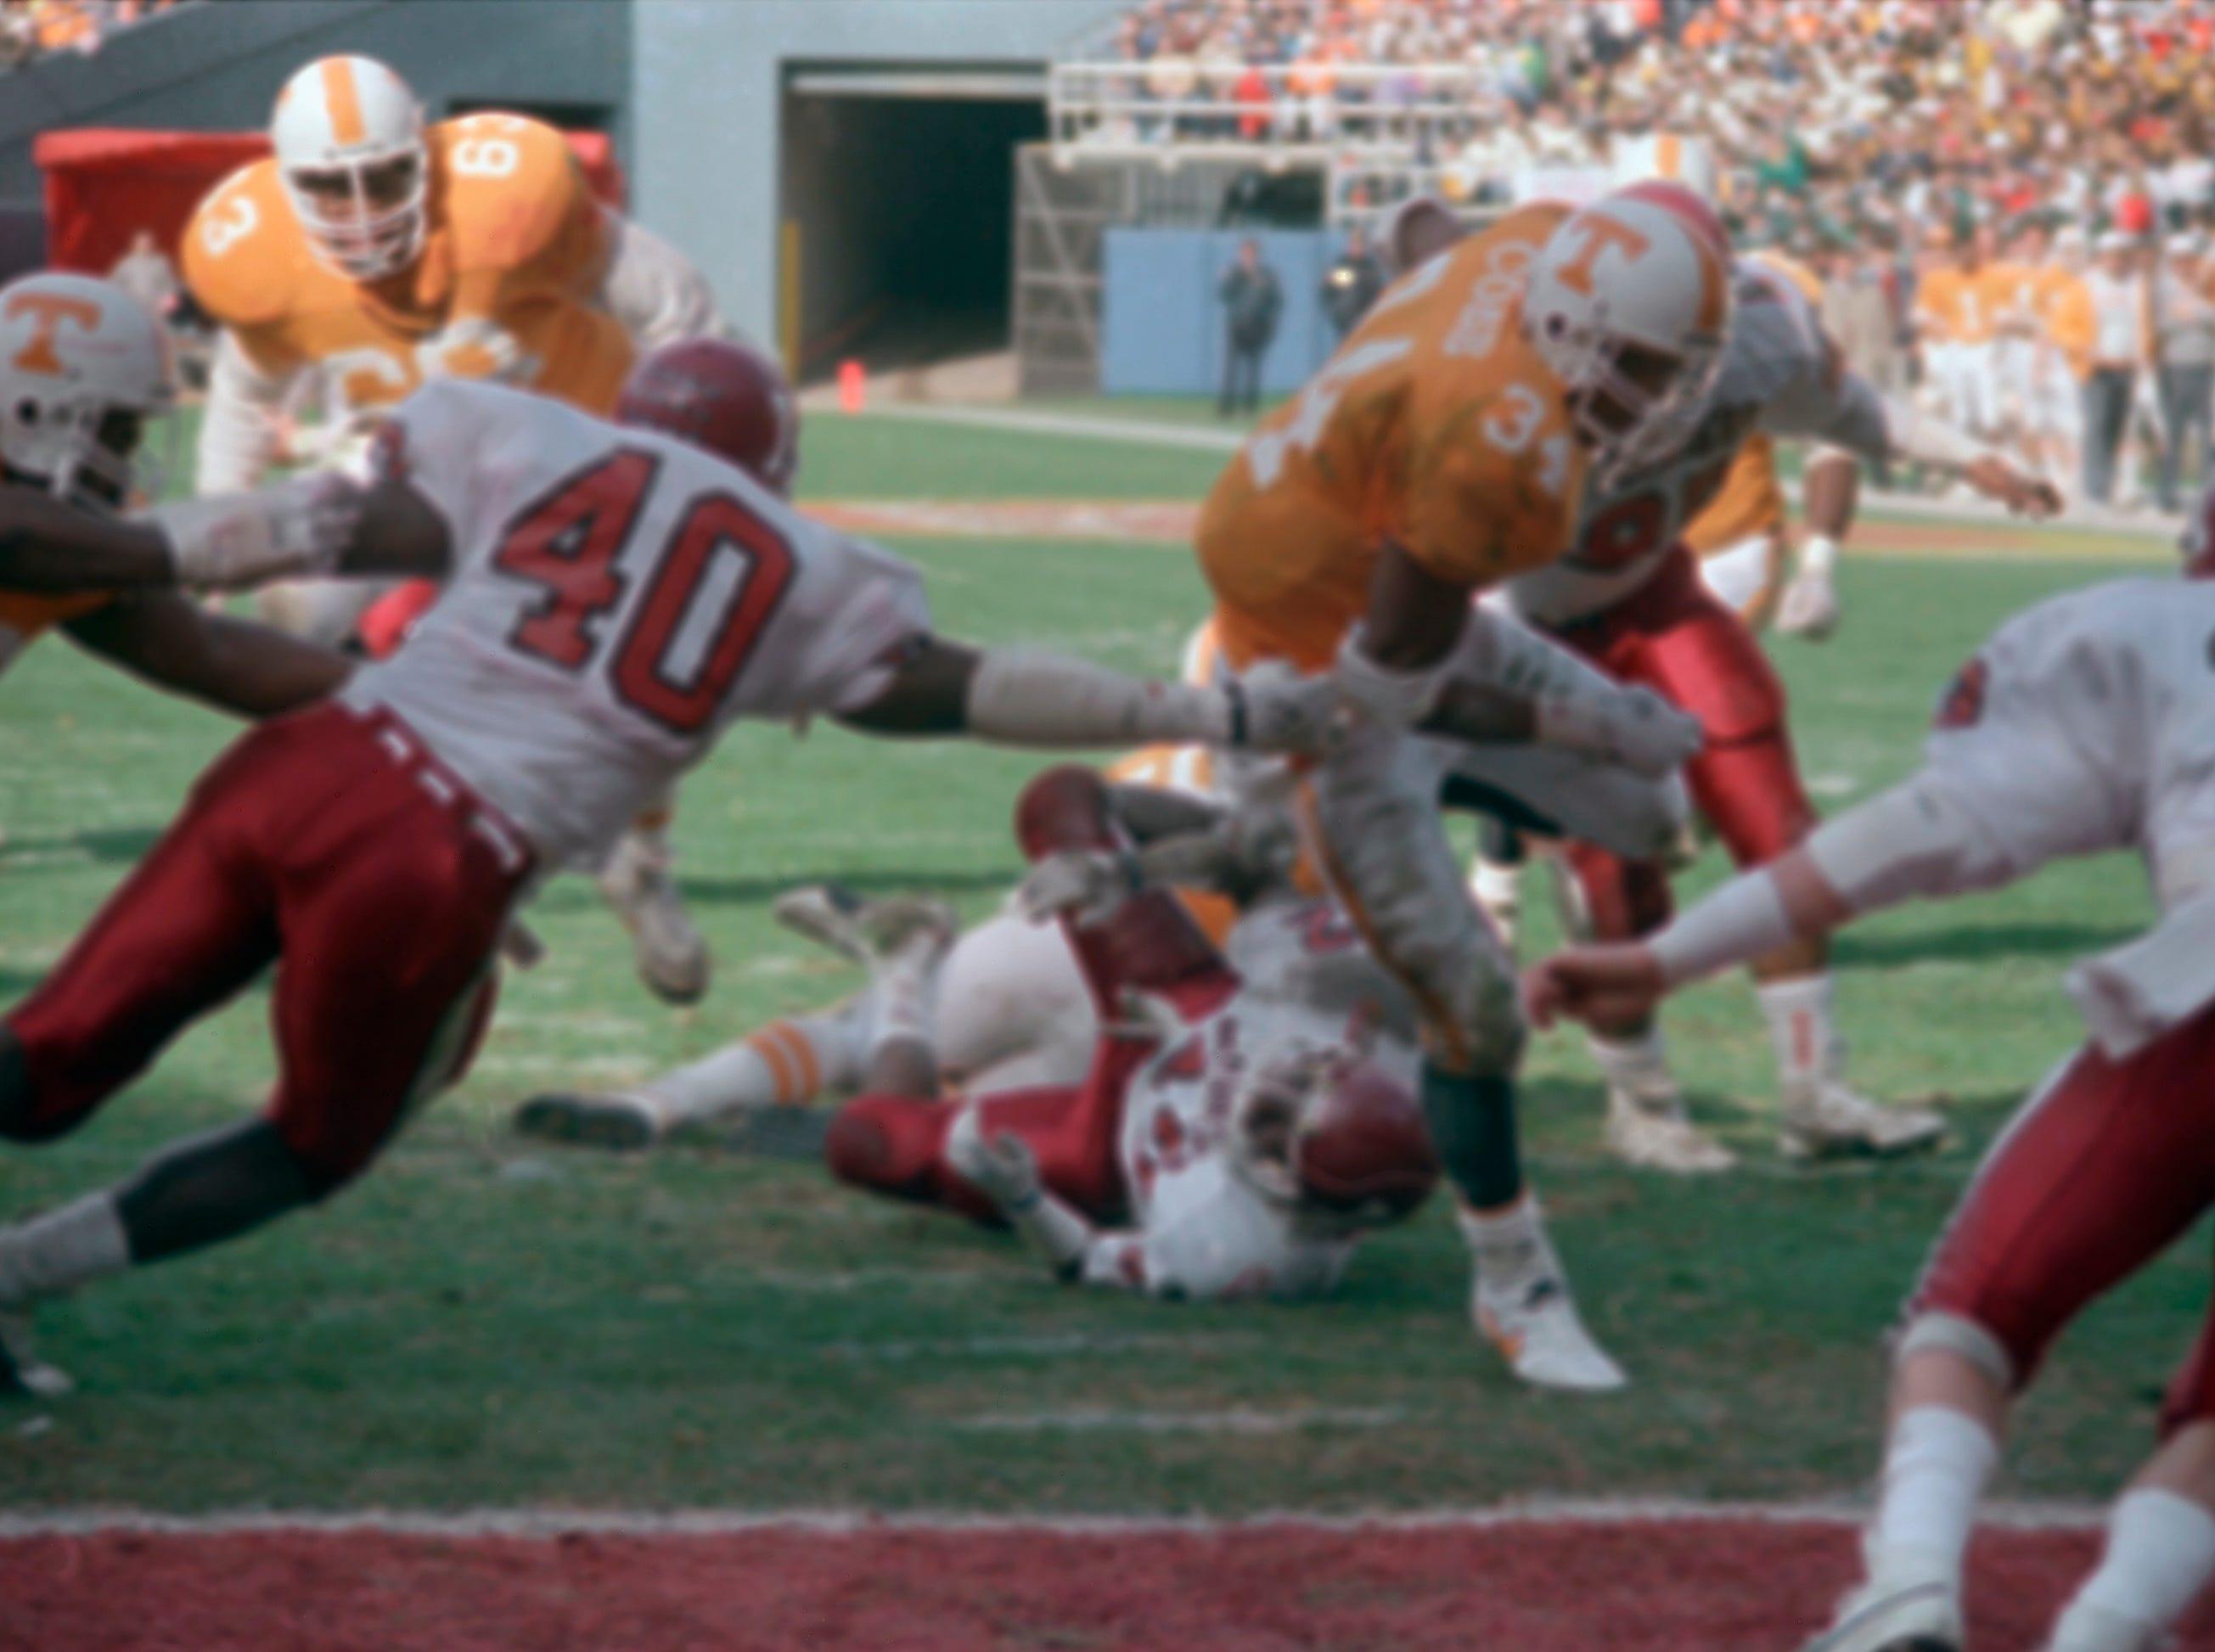 Tennessee running back Reggie Cobb, 34, pulls away from Indiana linebacker Darren Bush, 40, to score in first quarter of their Peach Bowl game at Atlanta Fulton County Stadium in Atlanta, on Jan. 2, 1987.